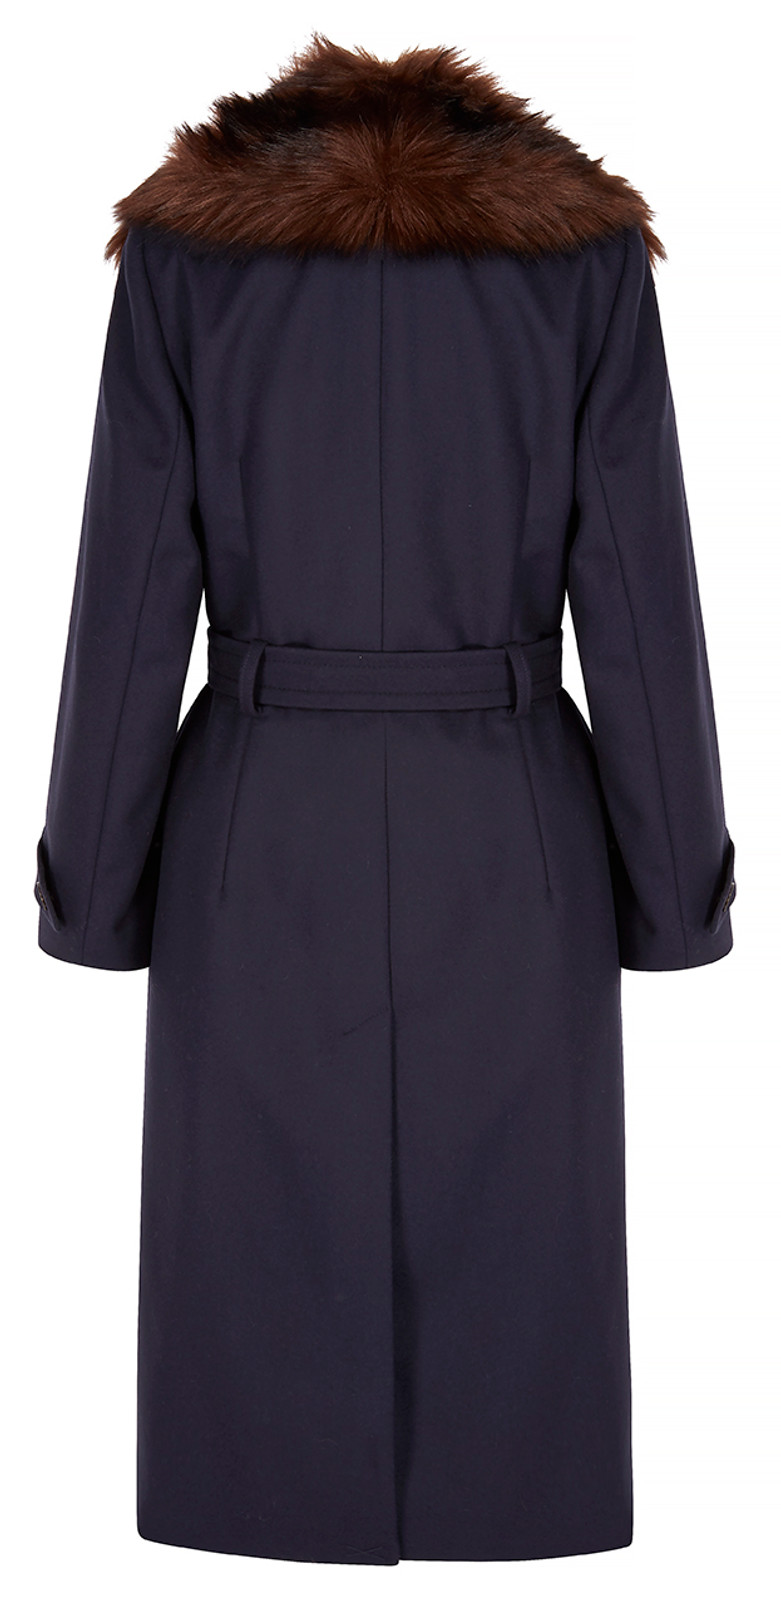 Fur Collar Coat, Navy